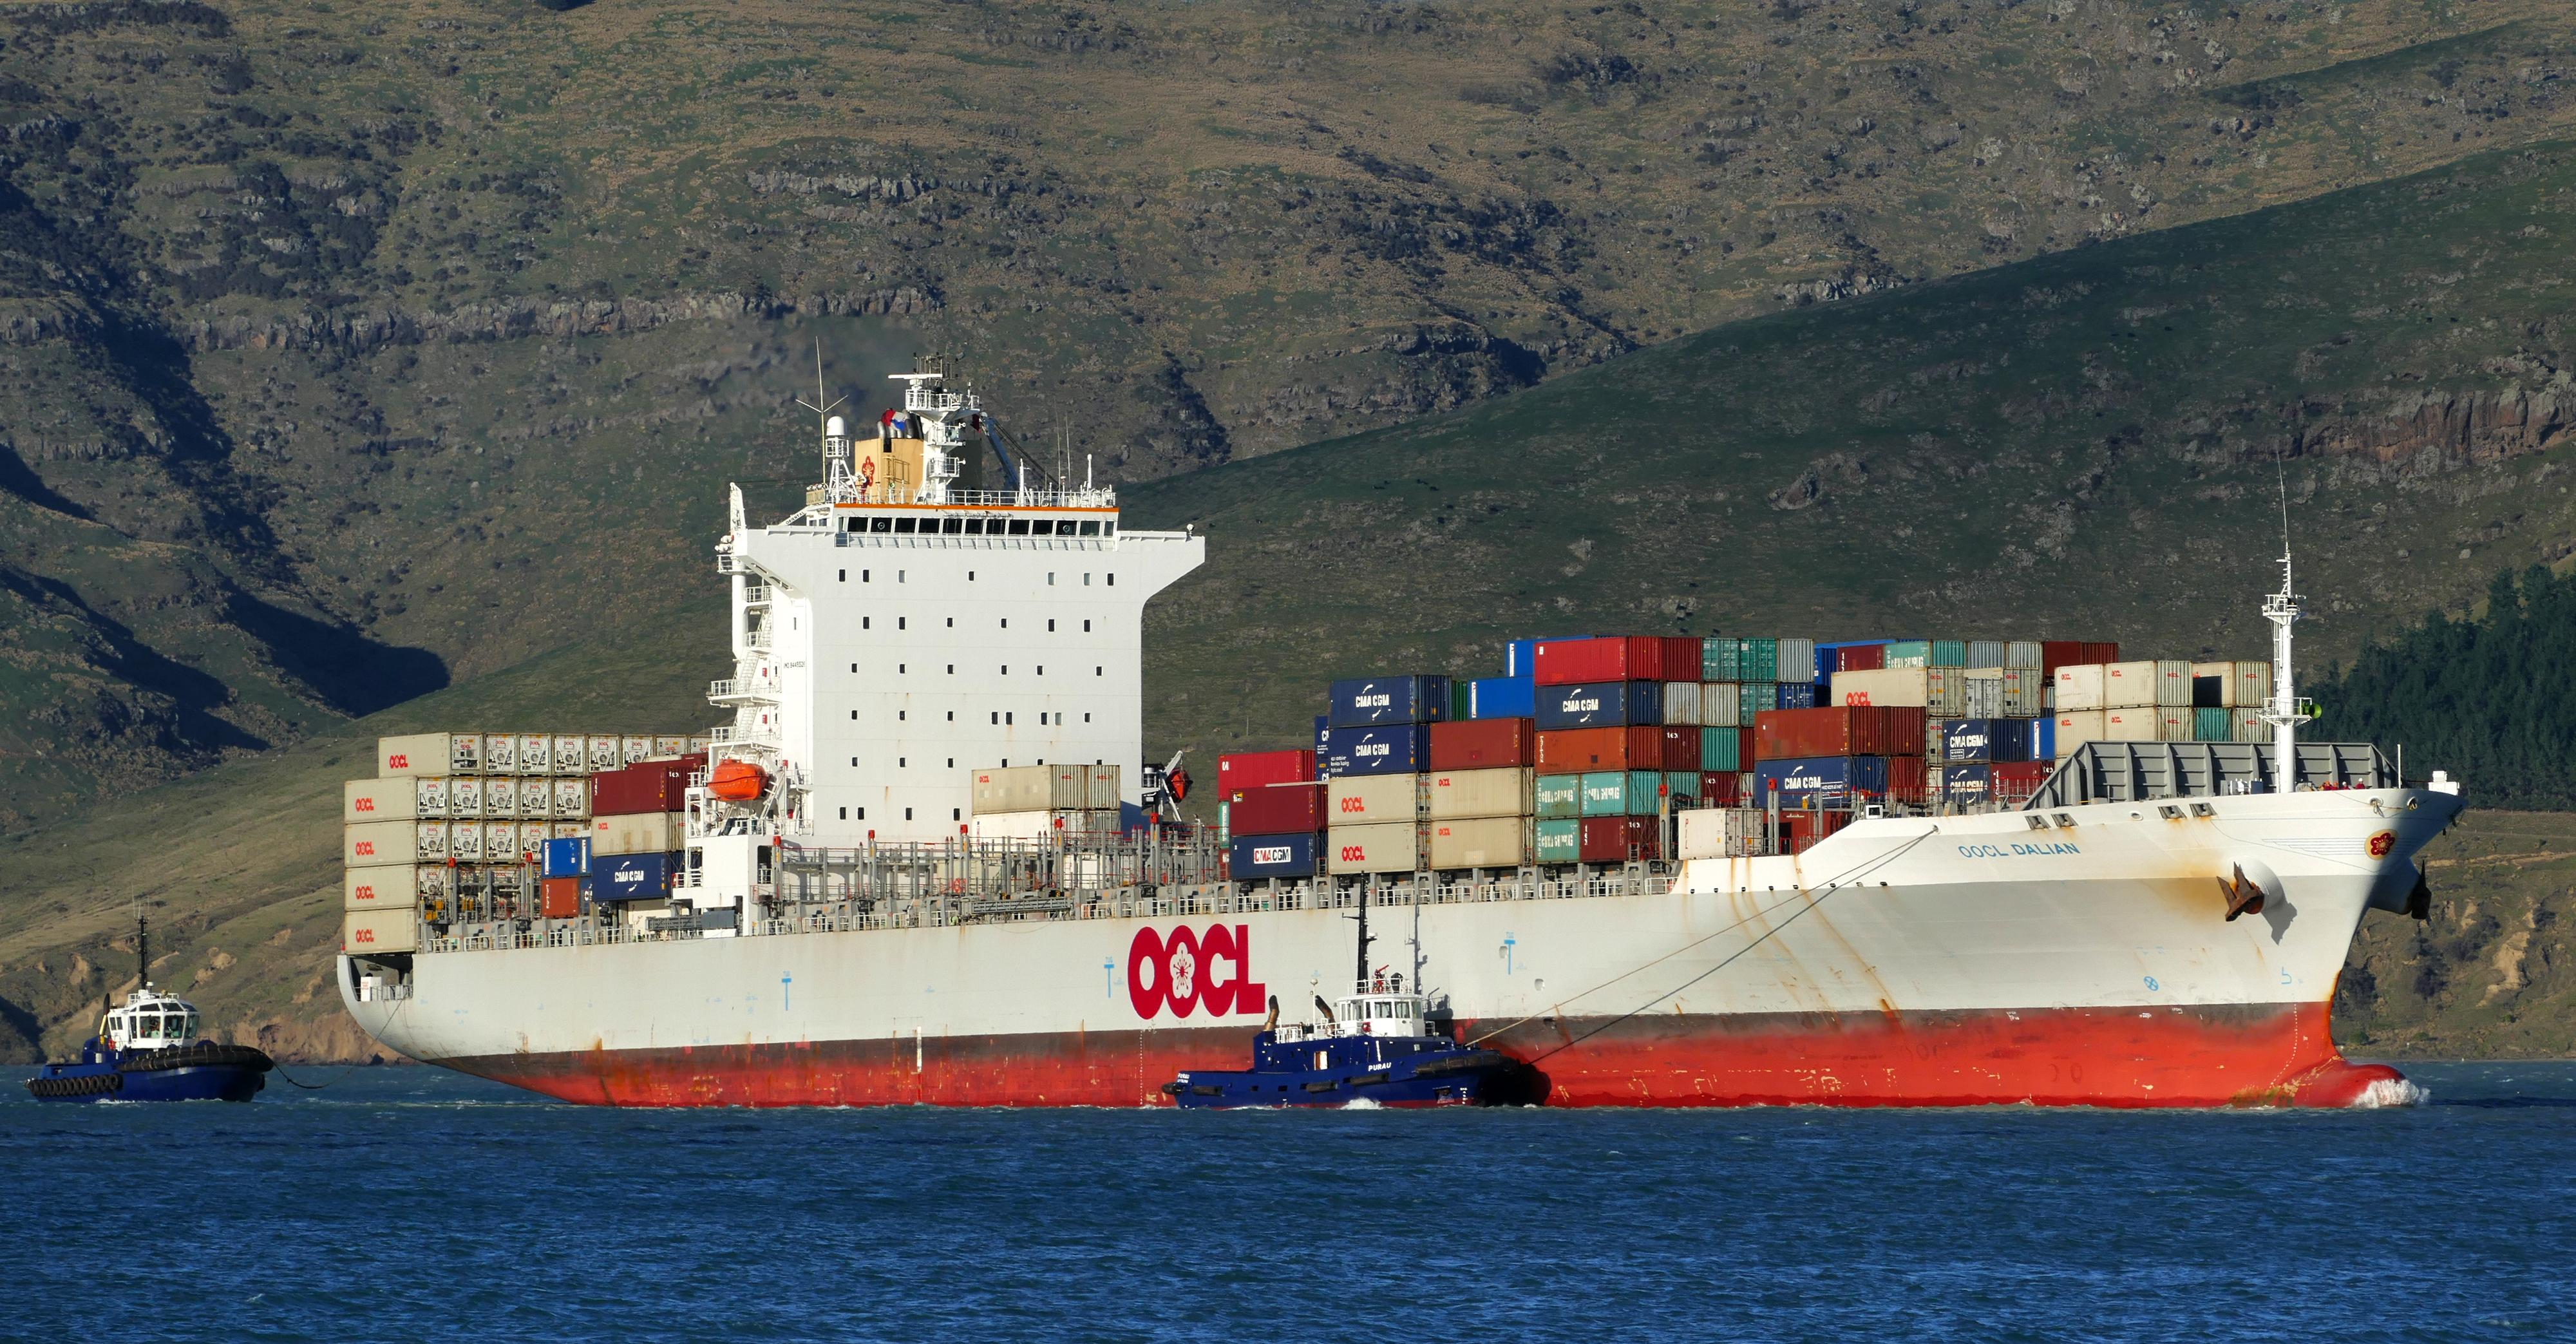 Oocl dalian.(container ship) photo